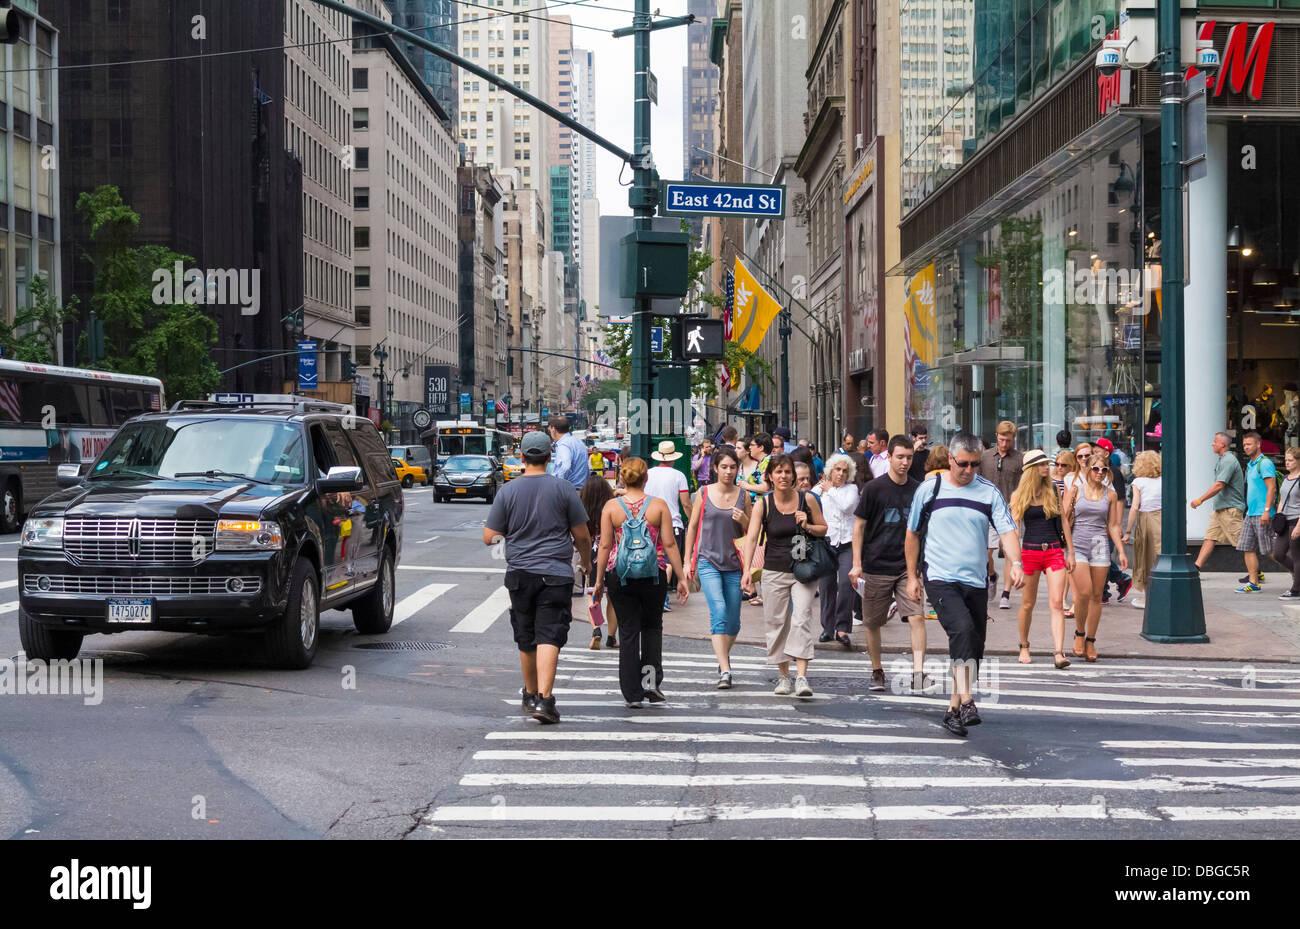 Manhattan New York street scene - people walking across a downtown crosswalk in Manhattan, New York City in summer - Stock Image